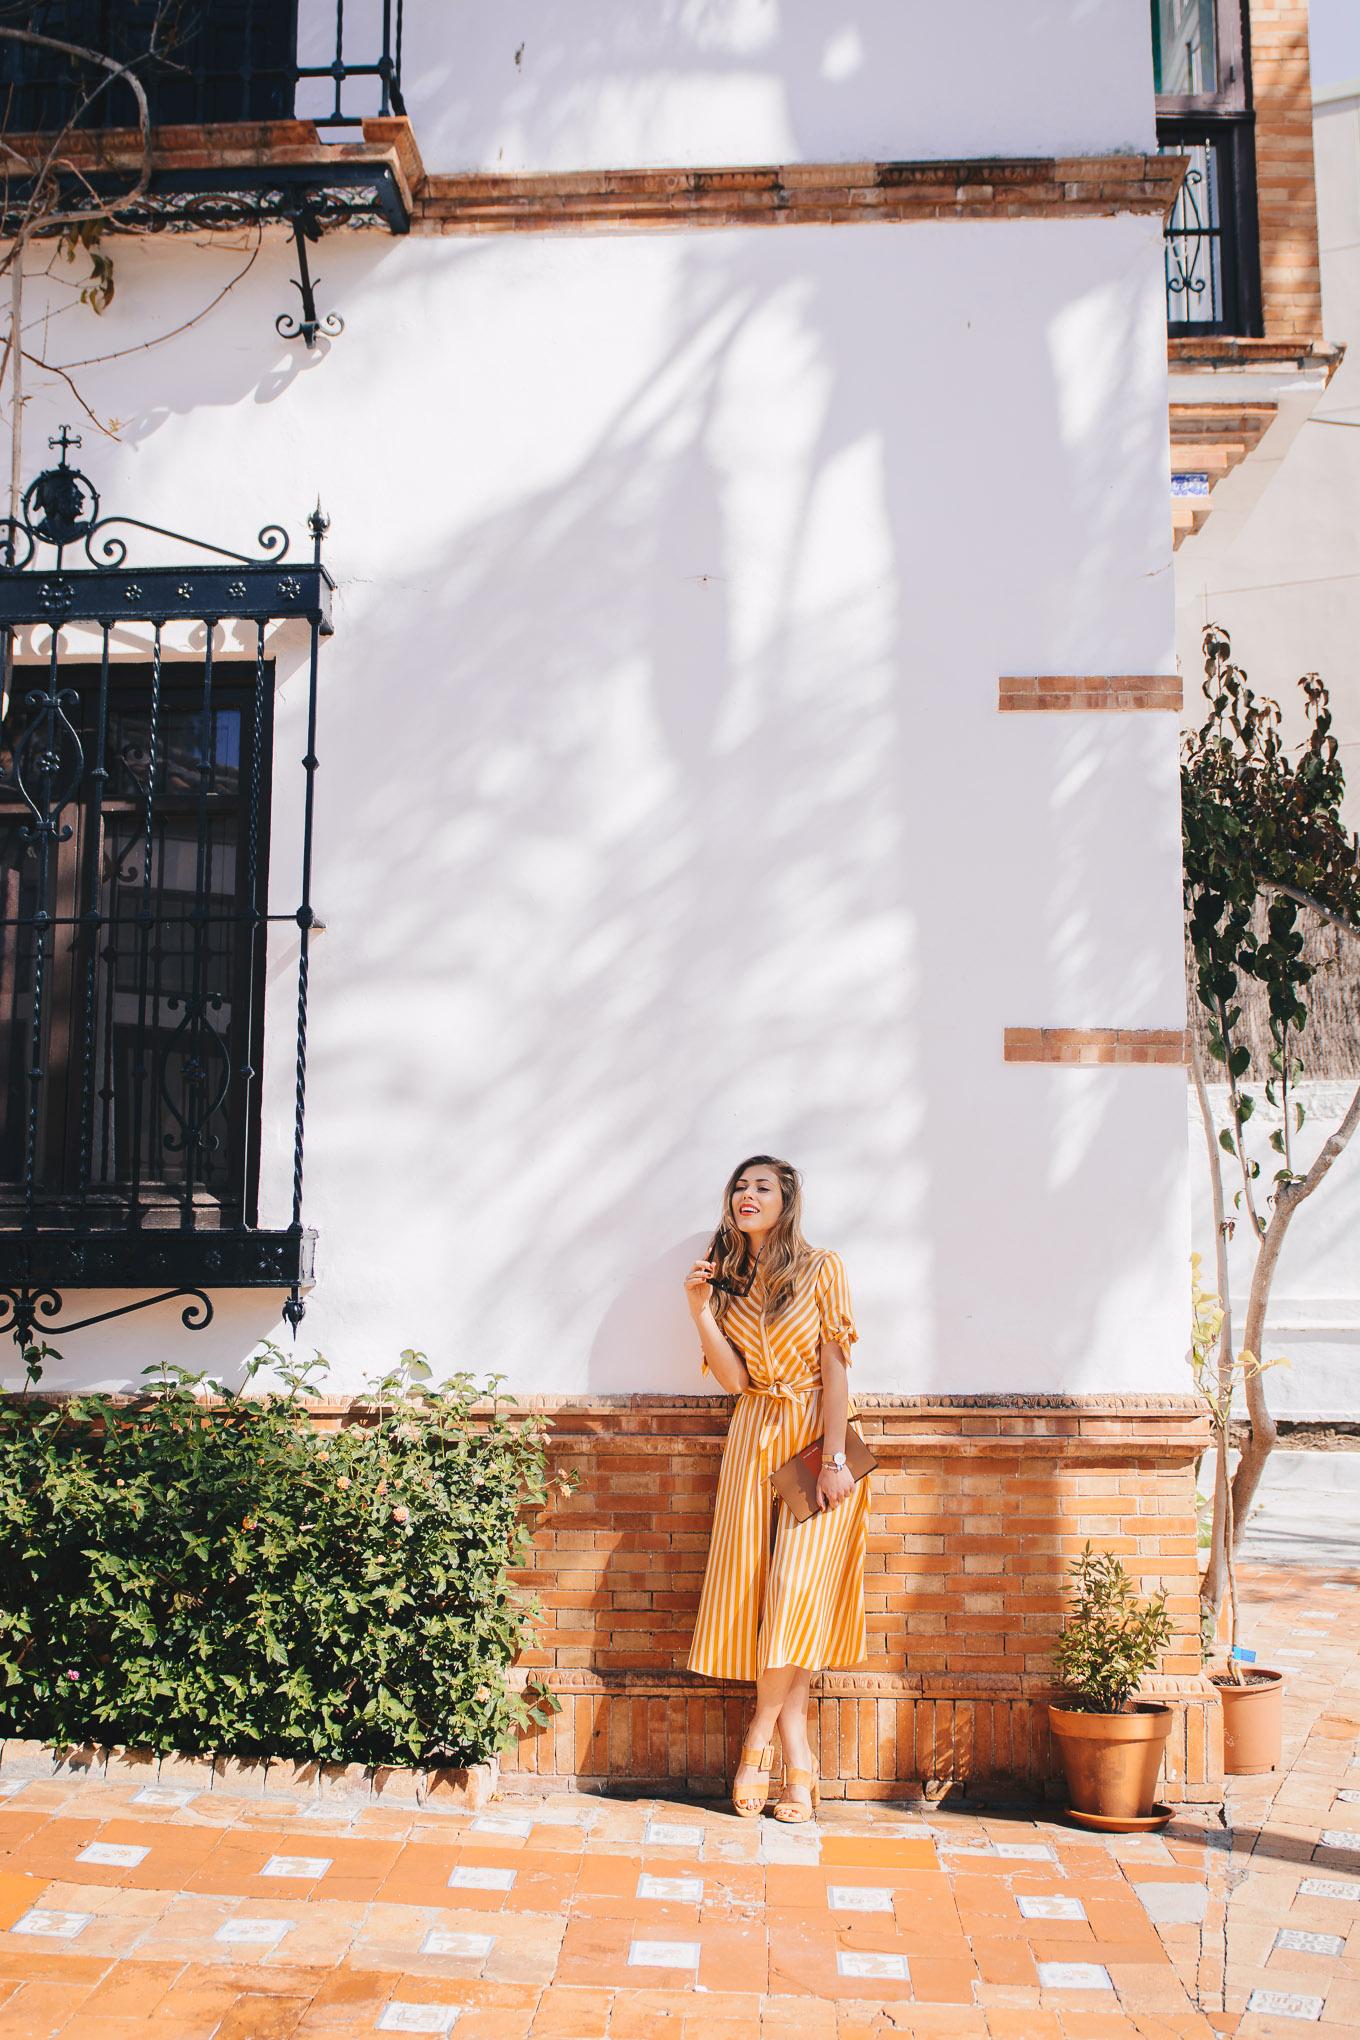 Wearing sunny striped dress